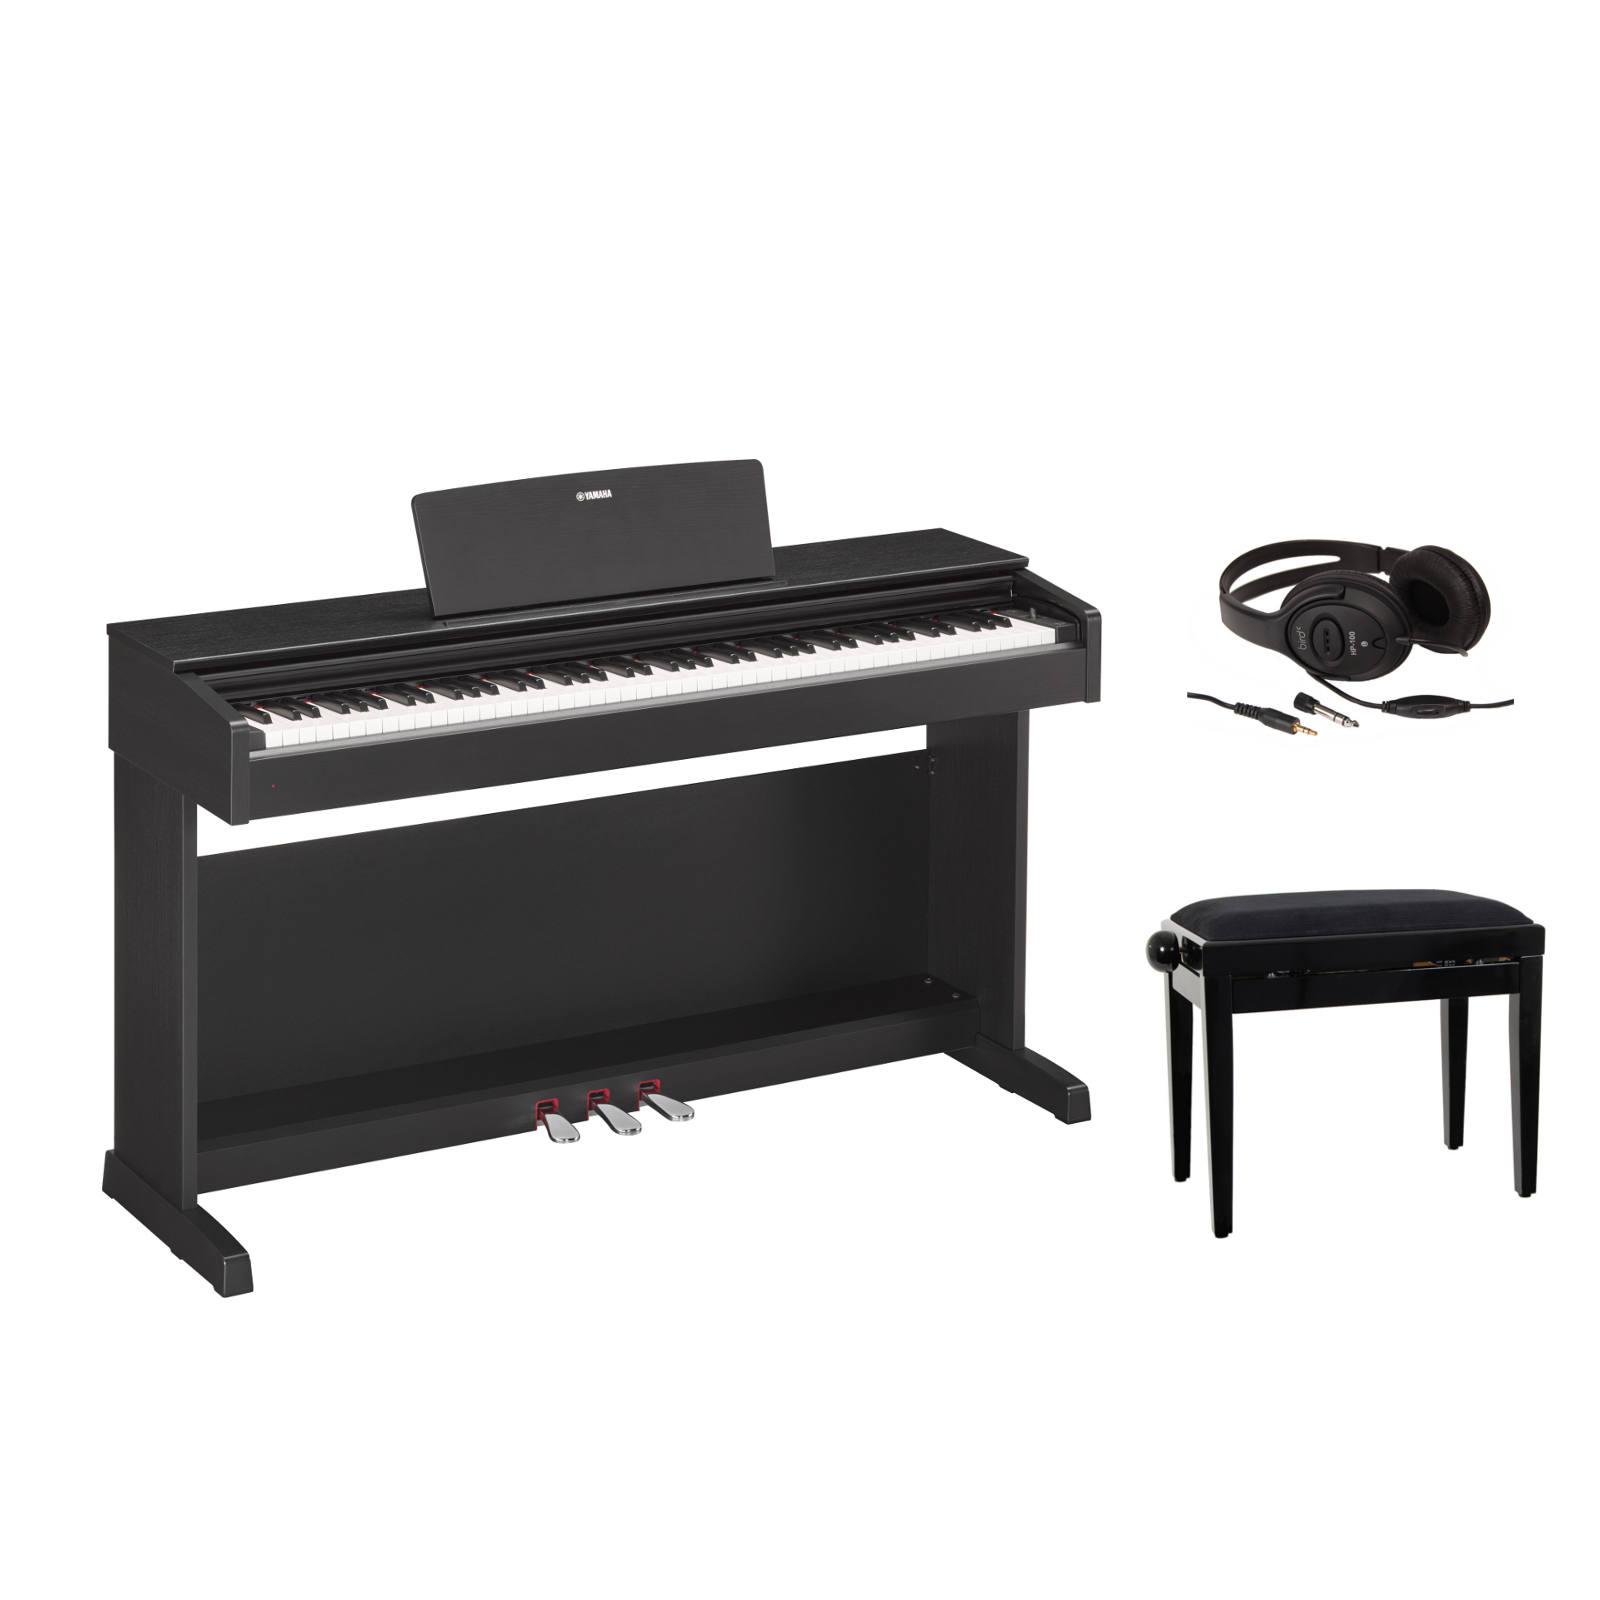 pack piano num rique yamaha p115 blanc support l85. Black Bedroom Furniture Sets. Home Design Ideas